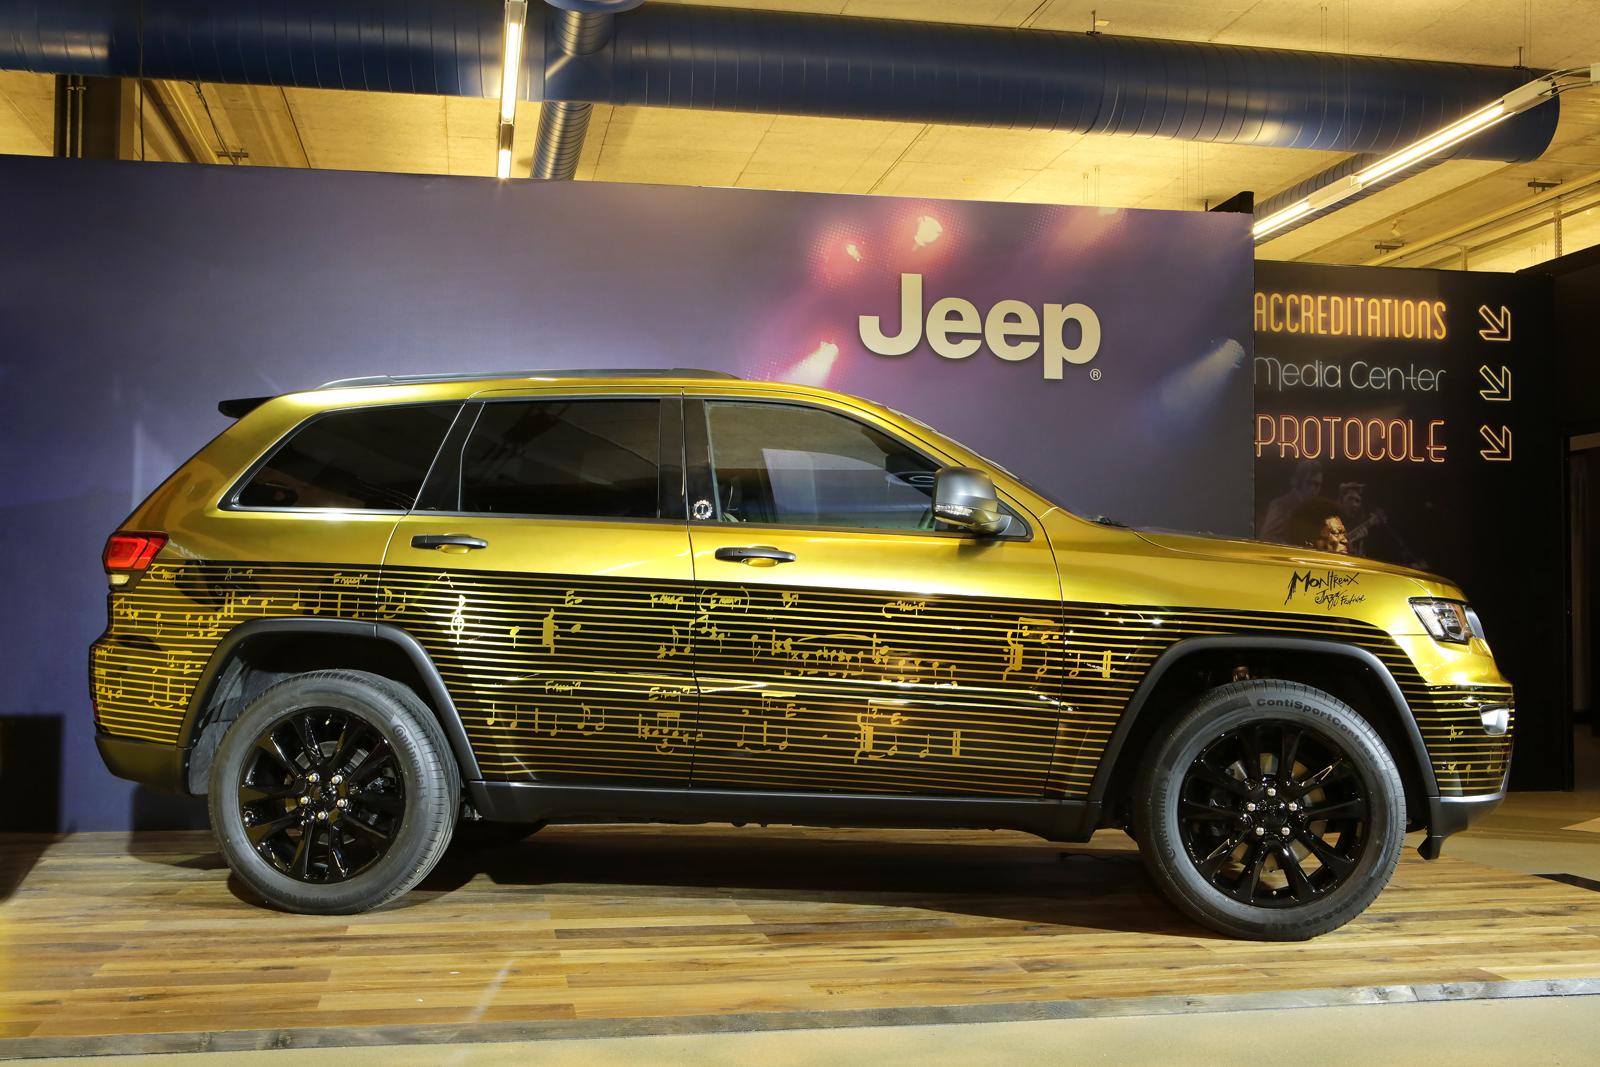 Jeep Montreux on Grand Cherokee Diesel Engine